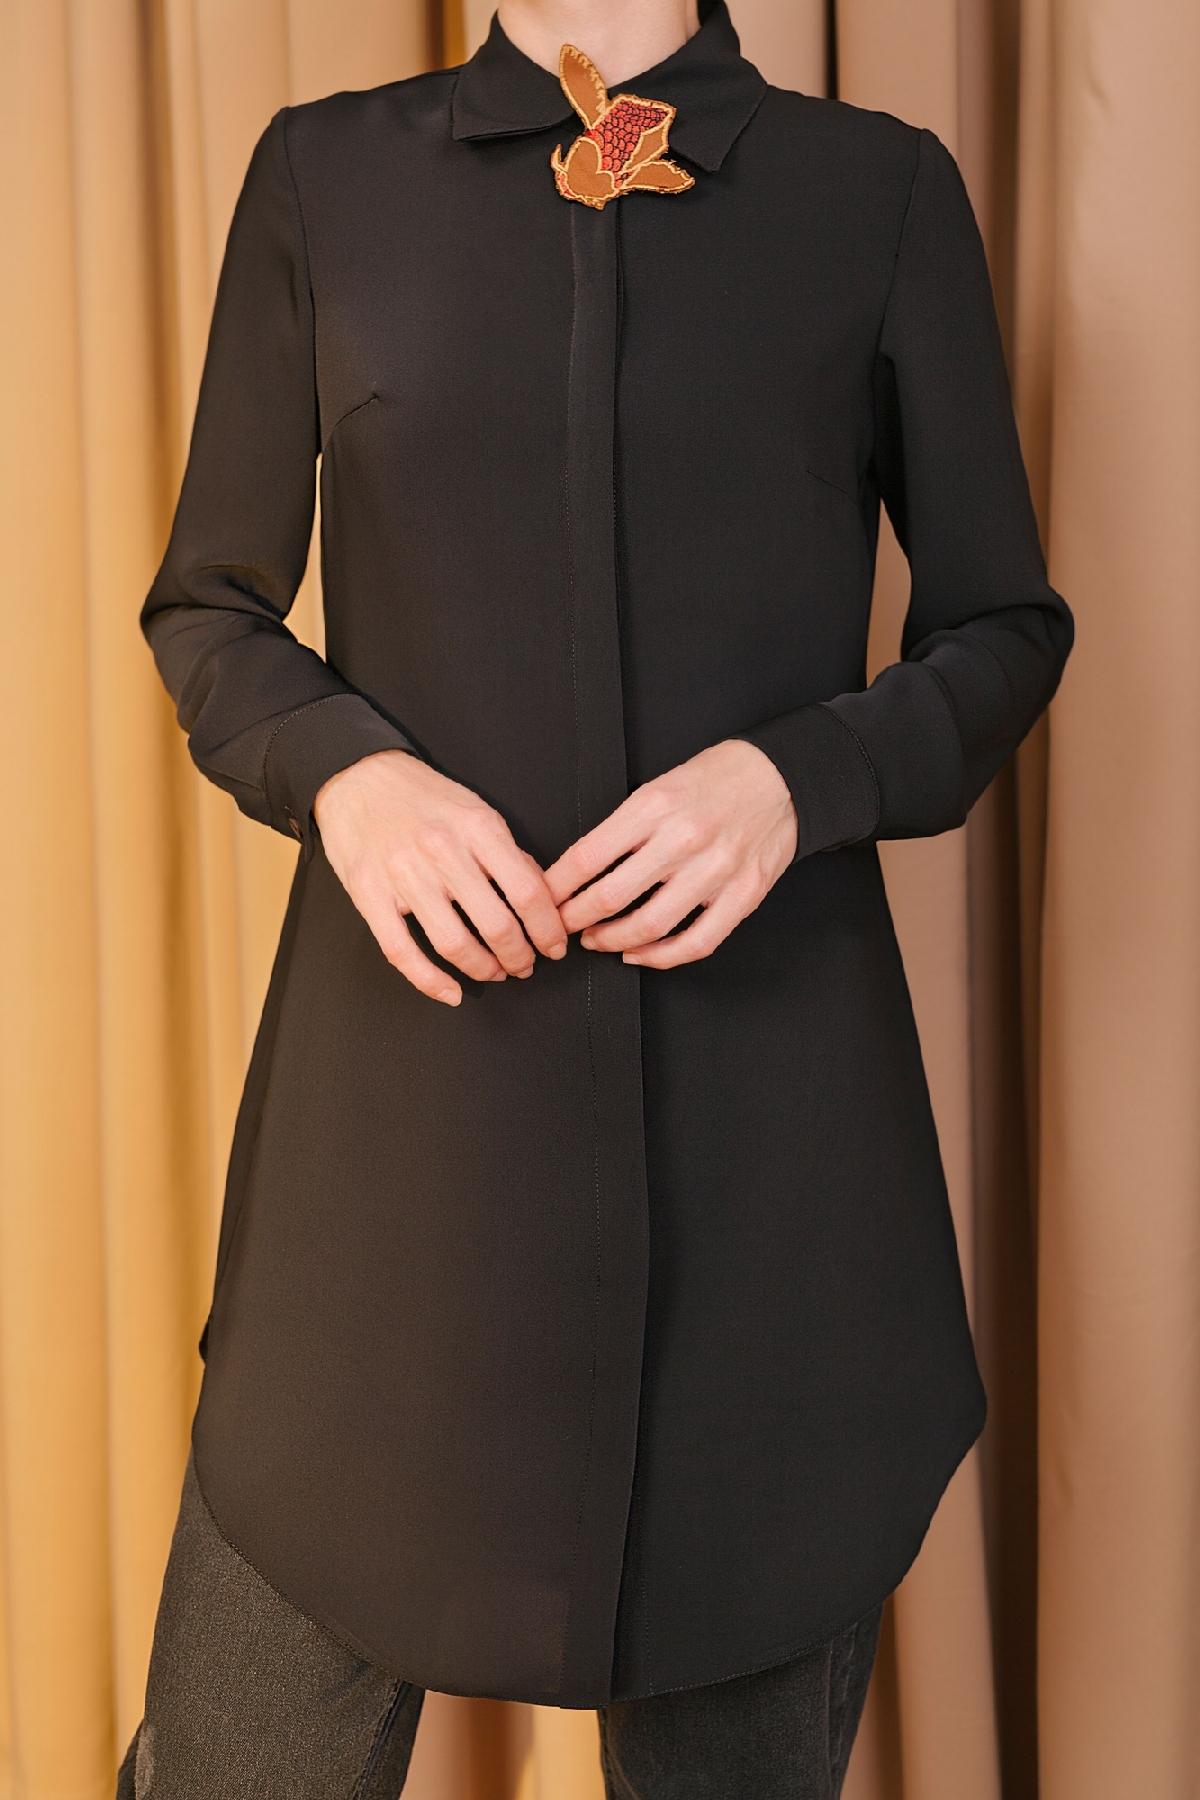 Kuaybe Gider - 5096 Tunik Siyah